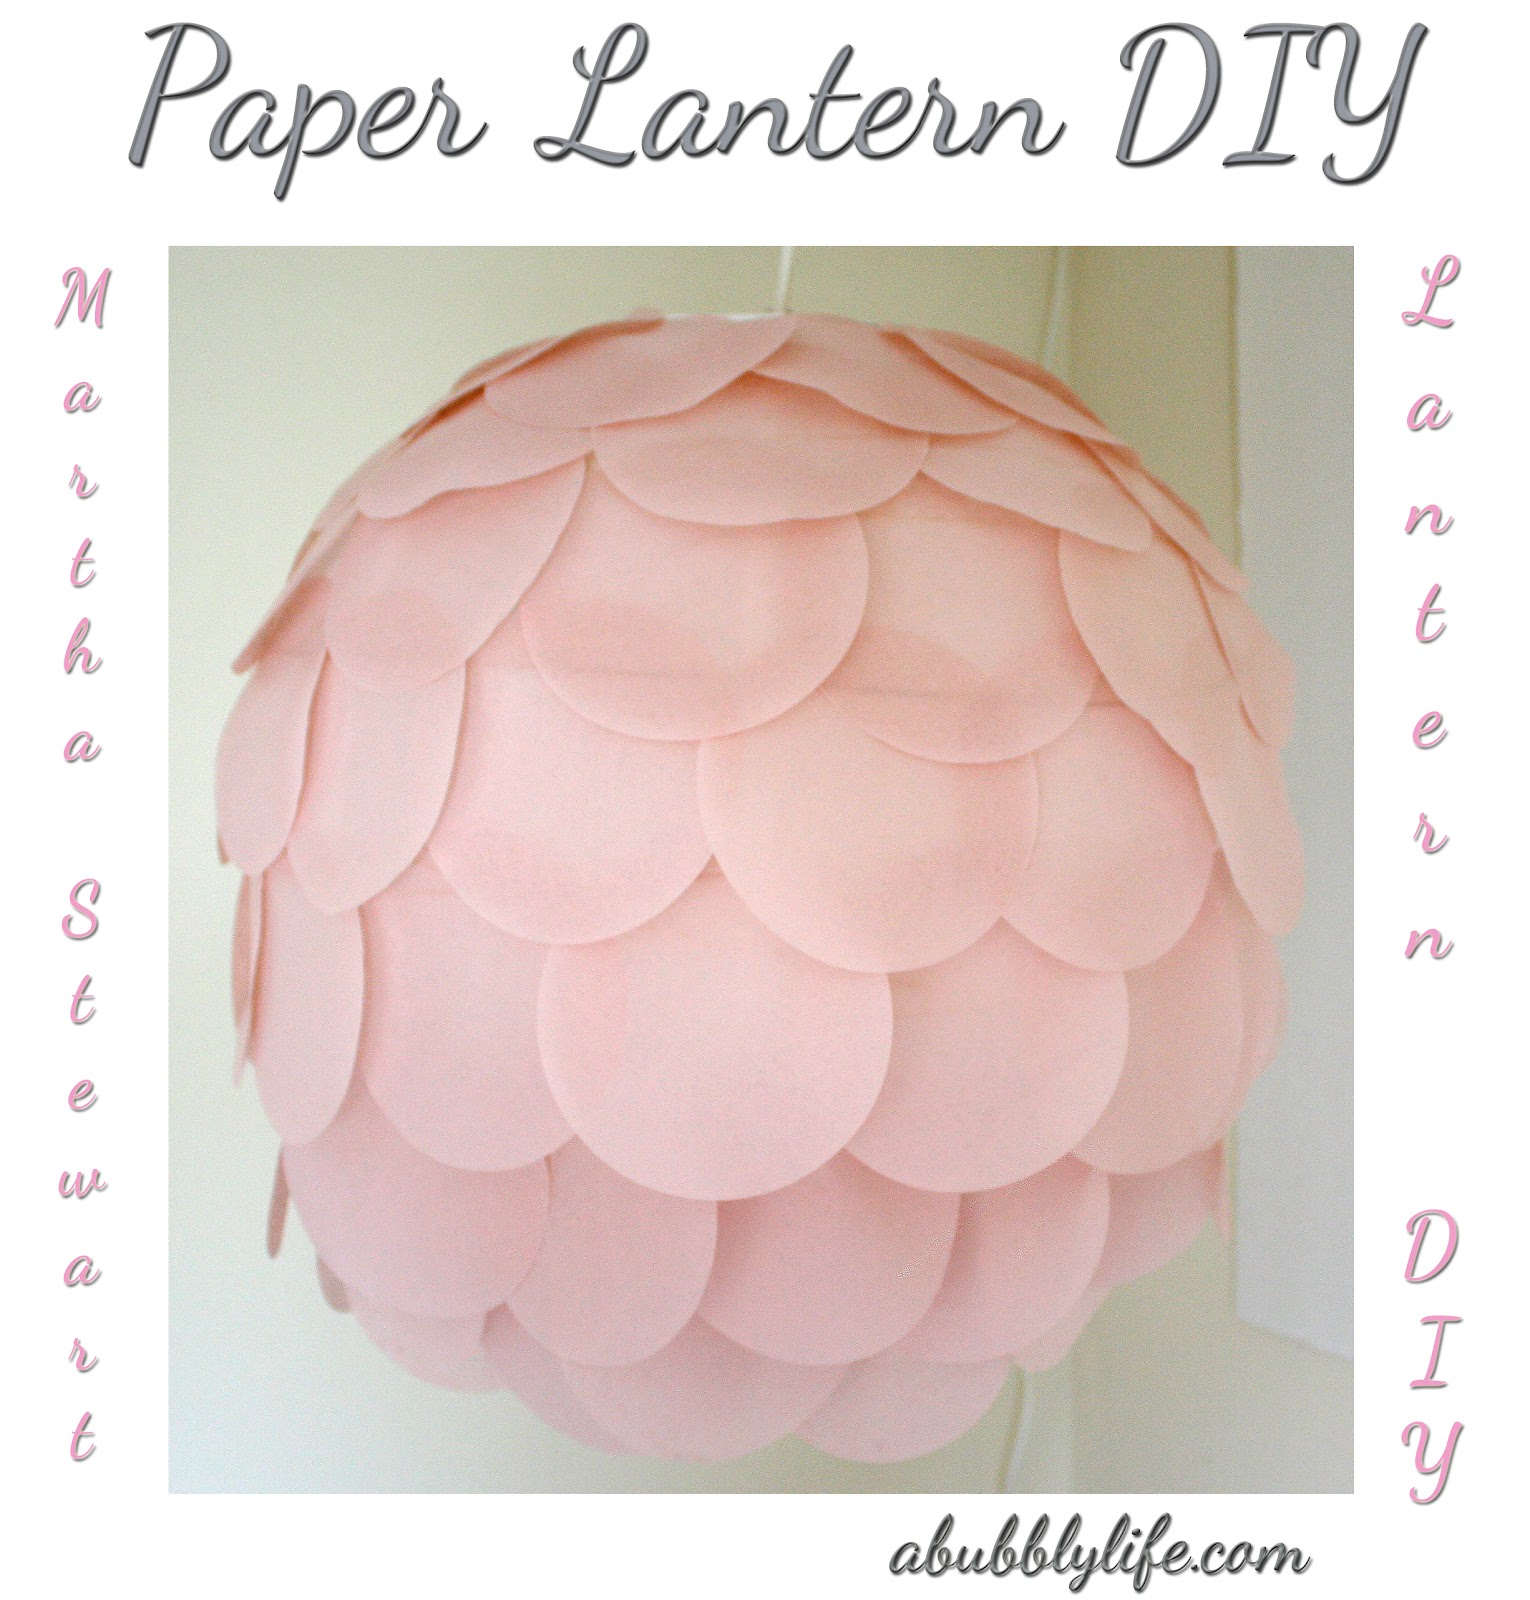 Bonafidebride diy project sweet whimsical paper lanterns - Http 2 Bp Blogspot Com Vauv4xpjrhs T7f Paper Lantern Diy